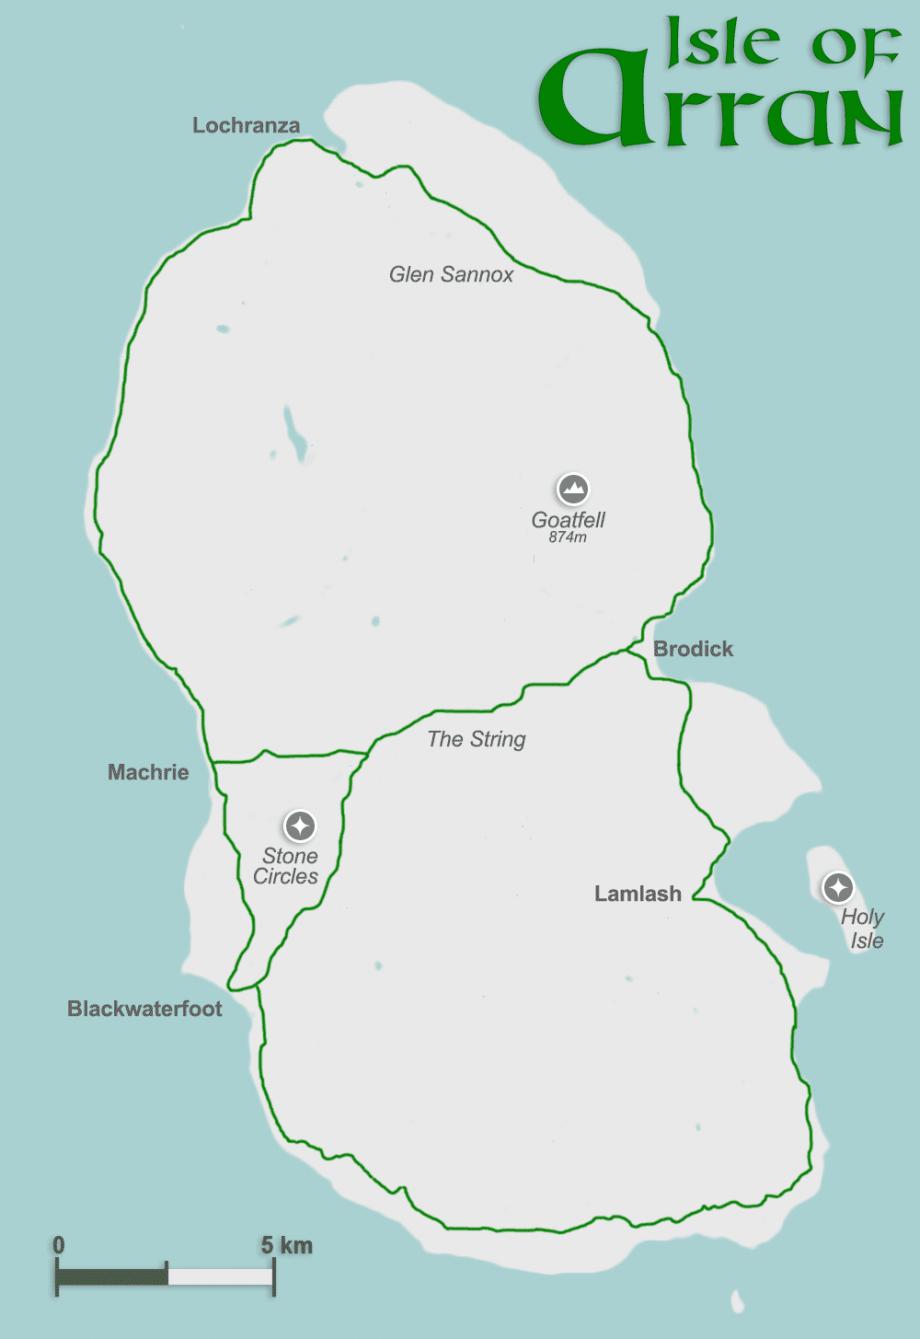 Karte Arran groß